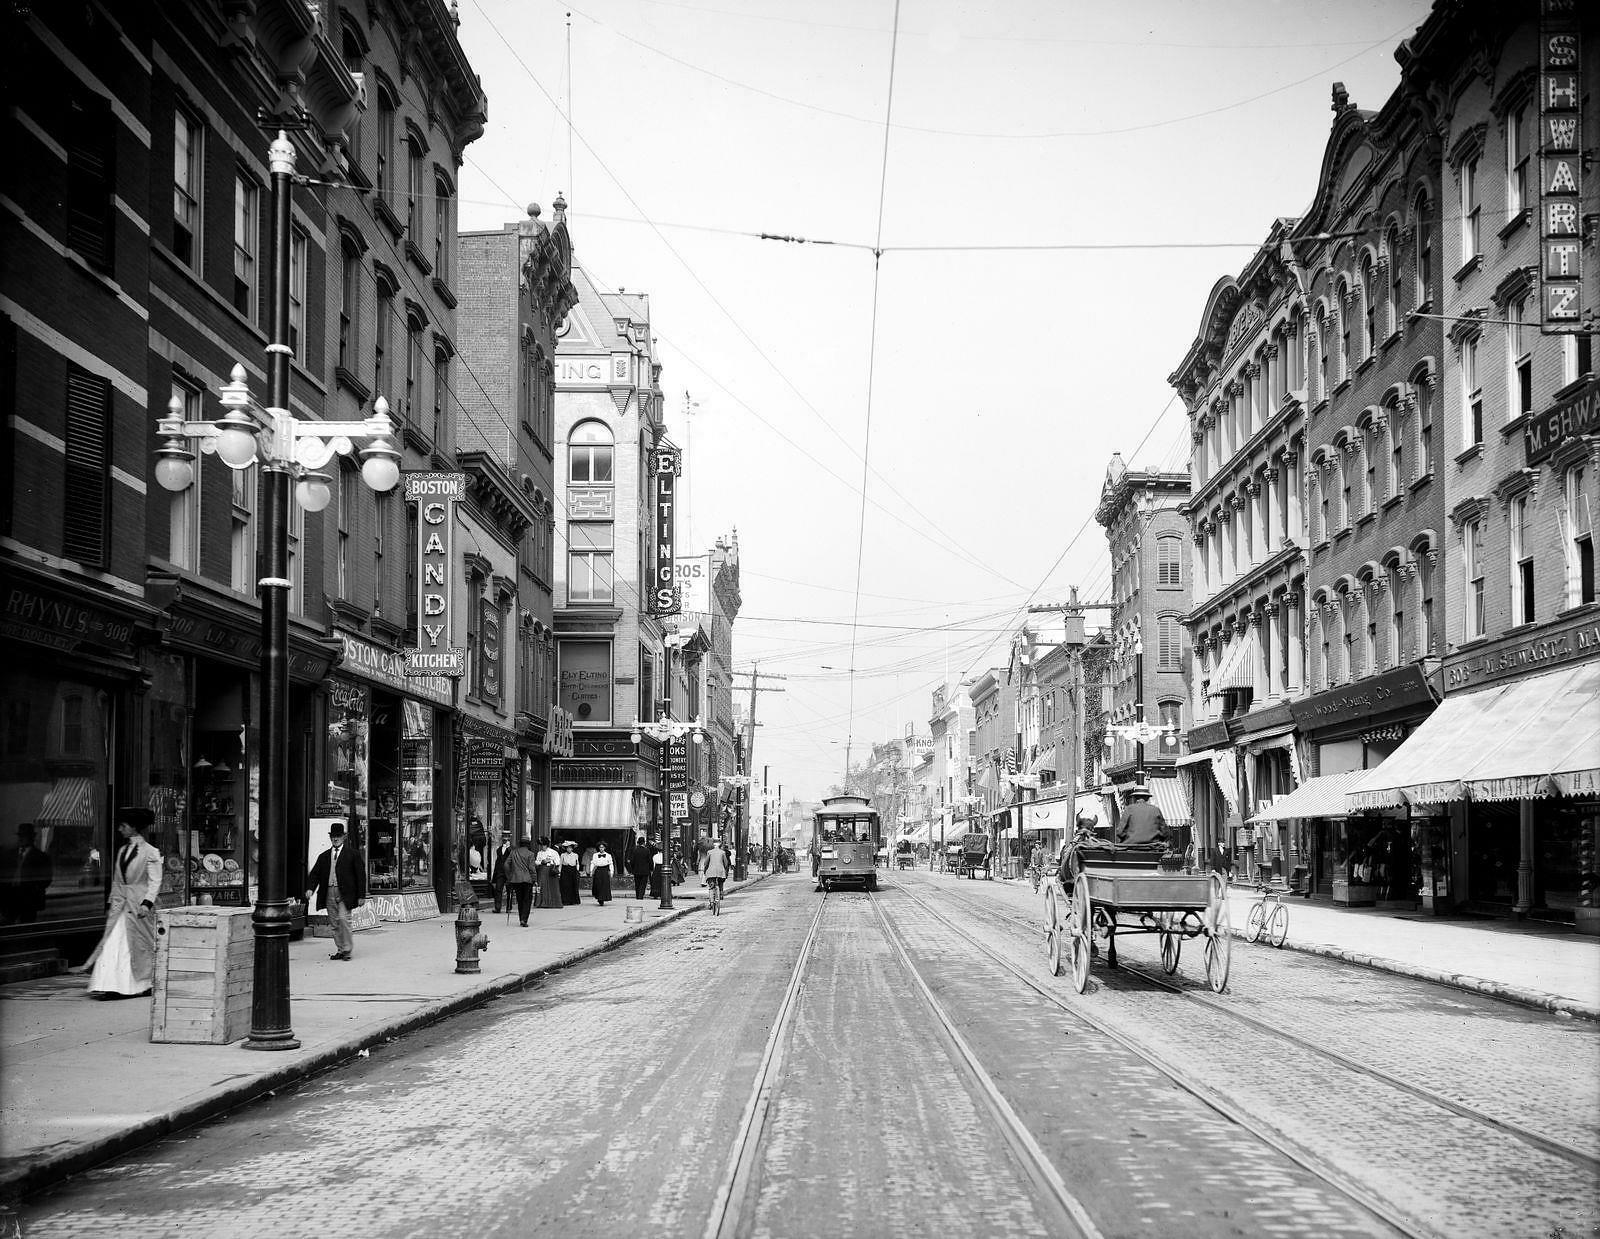 Main Street, Poughkeepsie NY, Dutchess County, Early 1900s